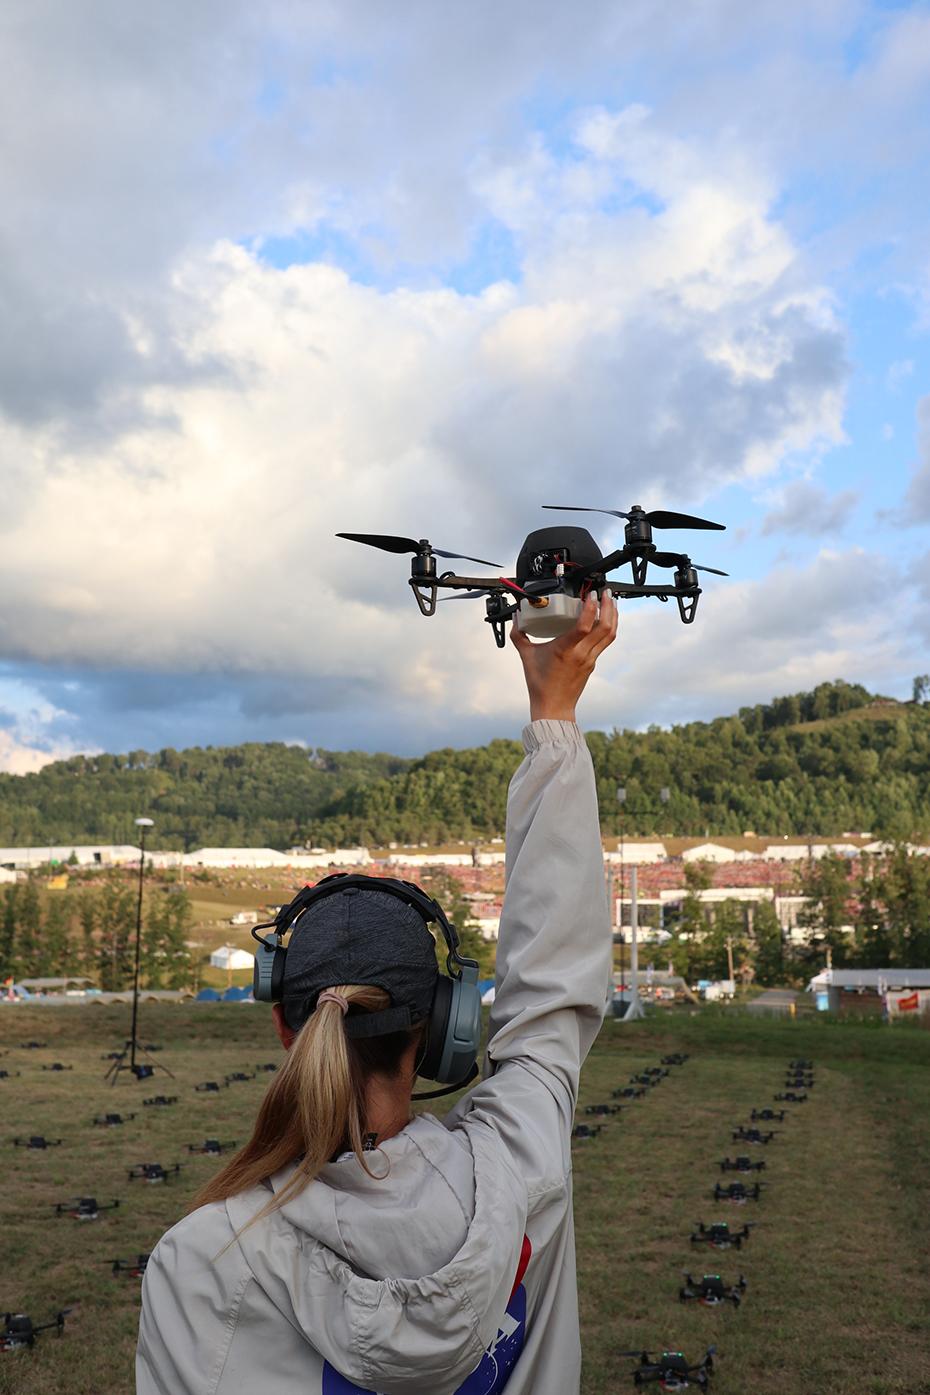 2021-0802-St-Pete-Drone-Show-930-1